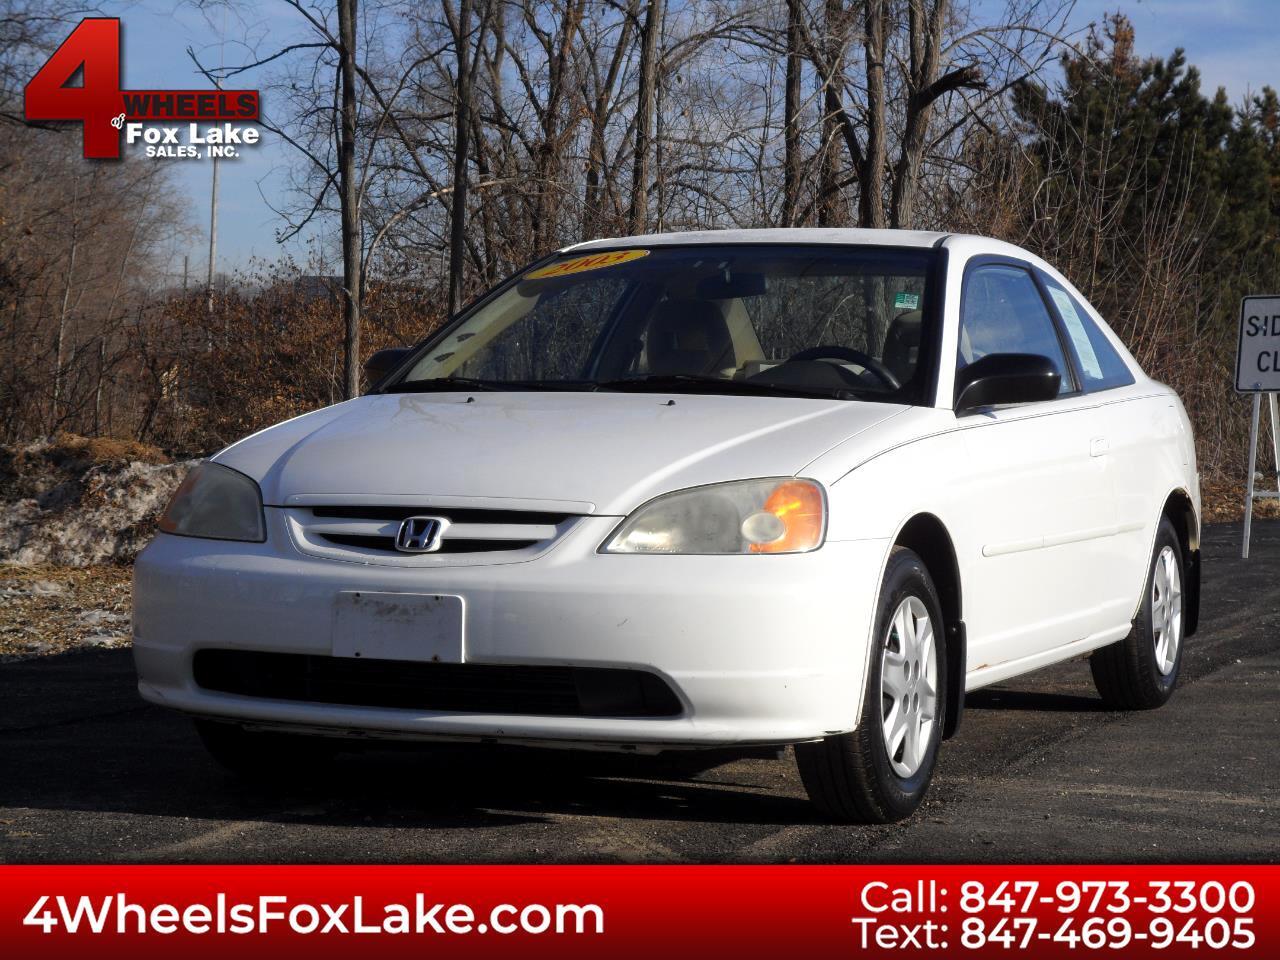 2003 Honda Civic LX coupe 4-spd AT